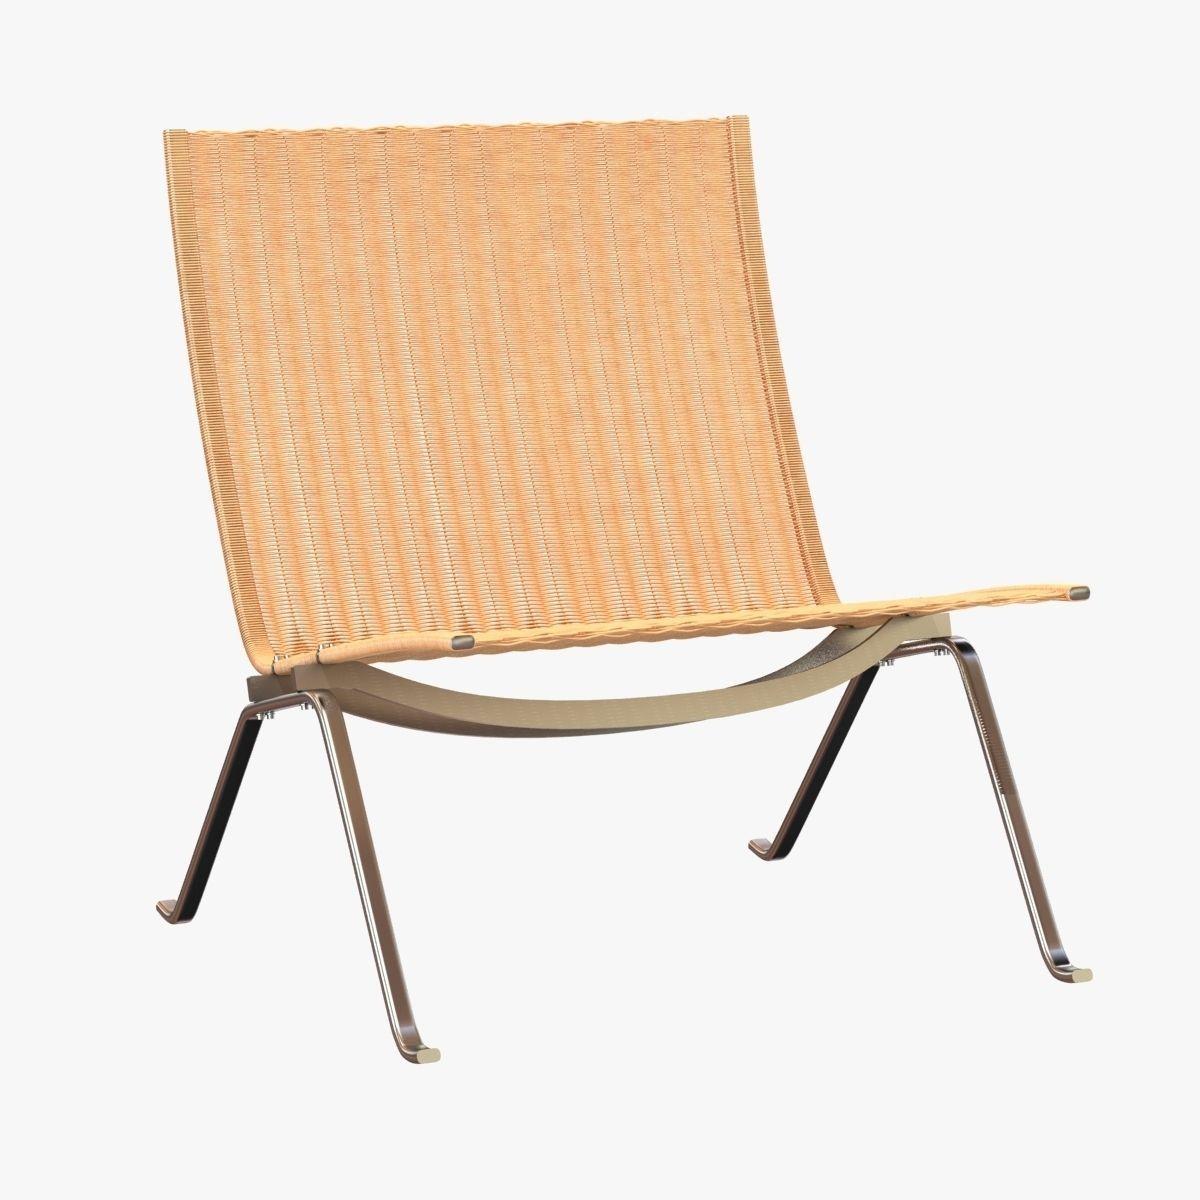 ... Poul Kjaerholm Rattan Lounge Chair 3d Model Max Obj 3ds Fbx Mtl 3 ...